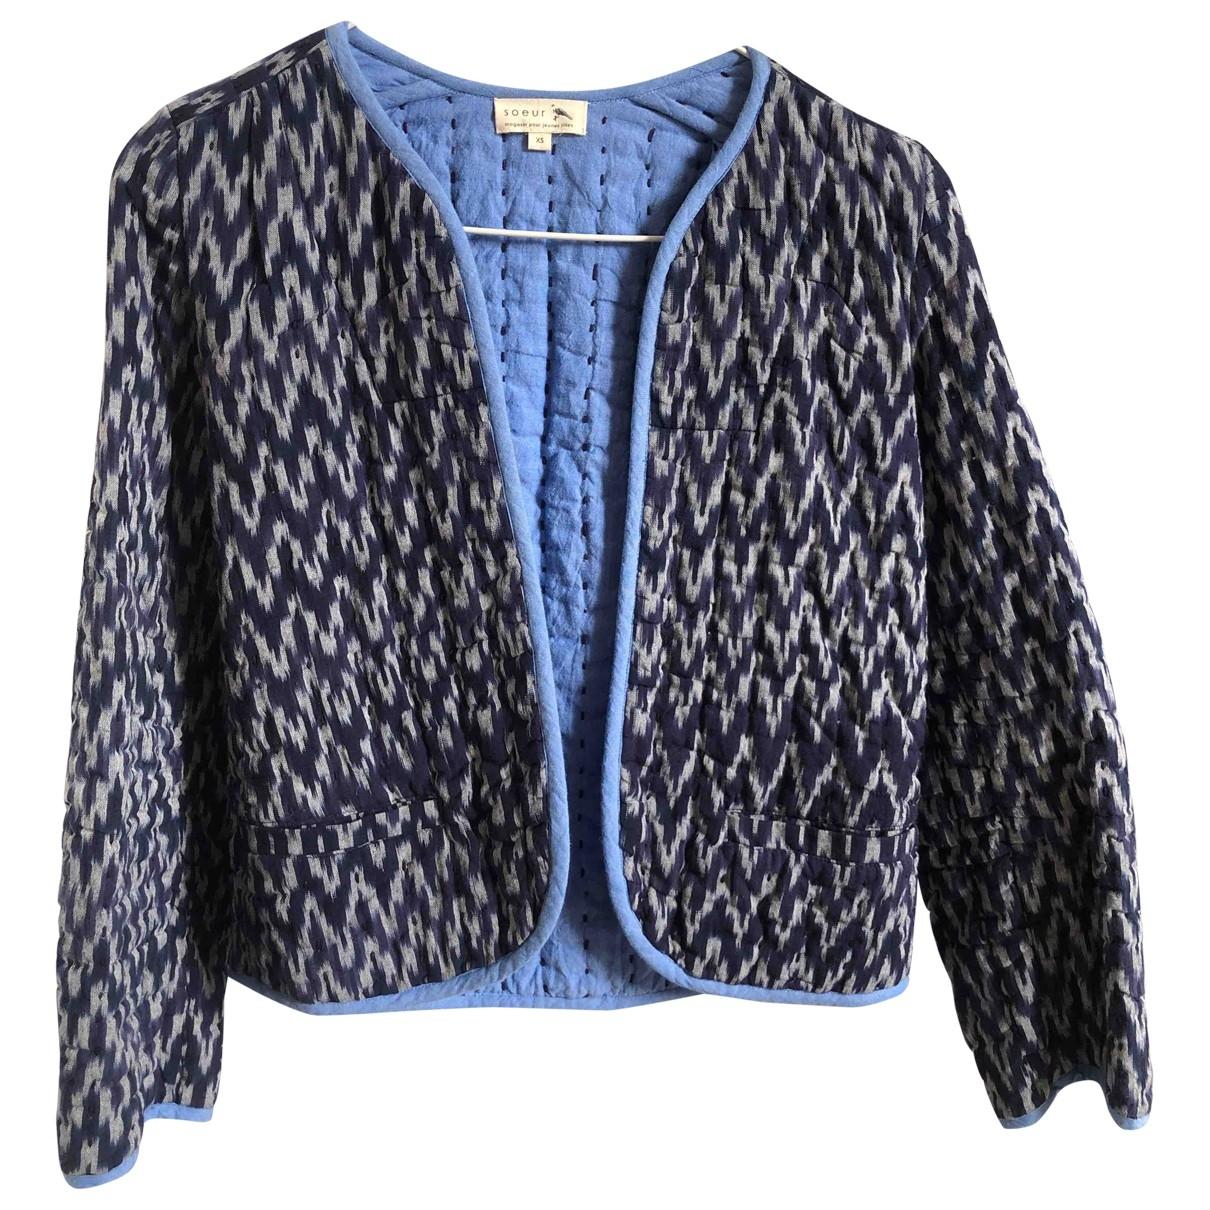 Soeur \N Blue Cotton jacket & coat for Kids 14 years - S FR